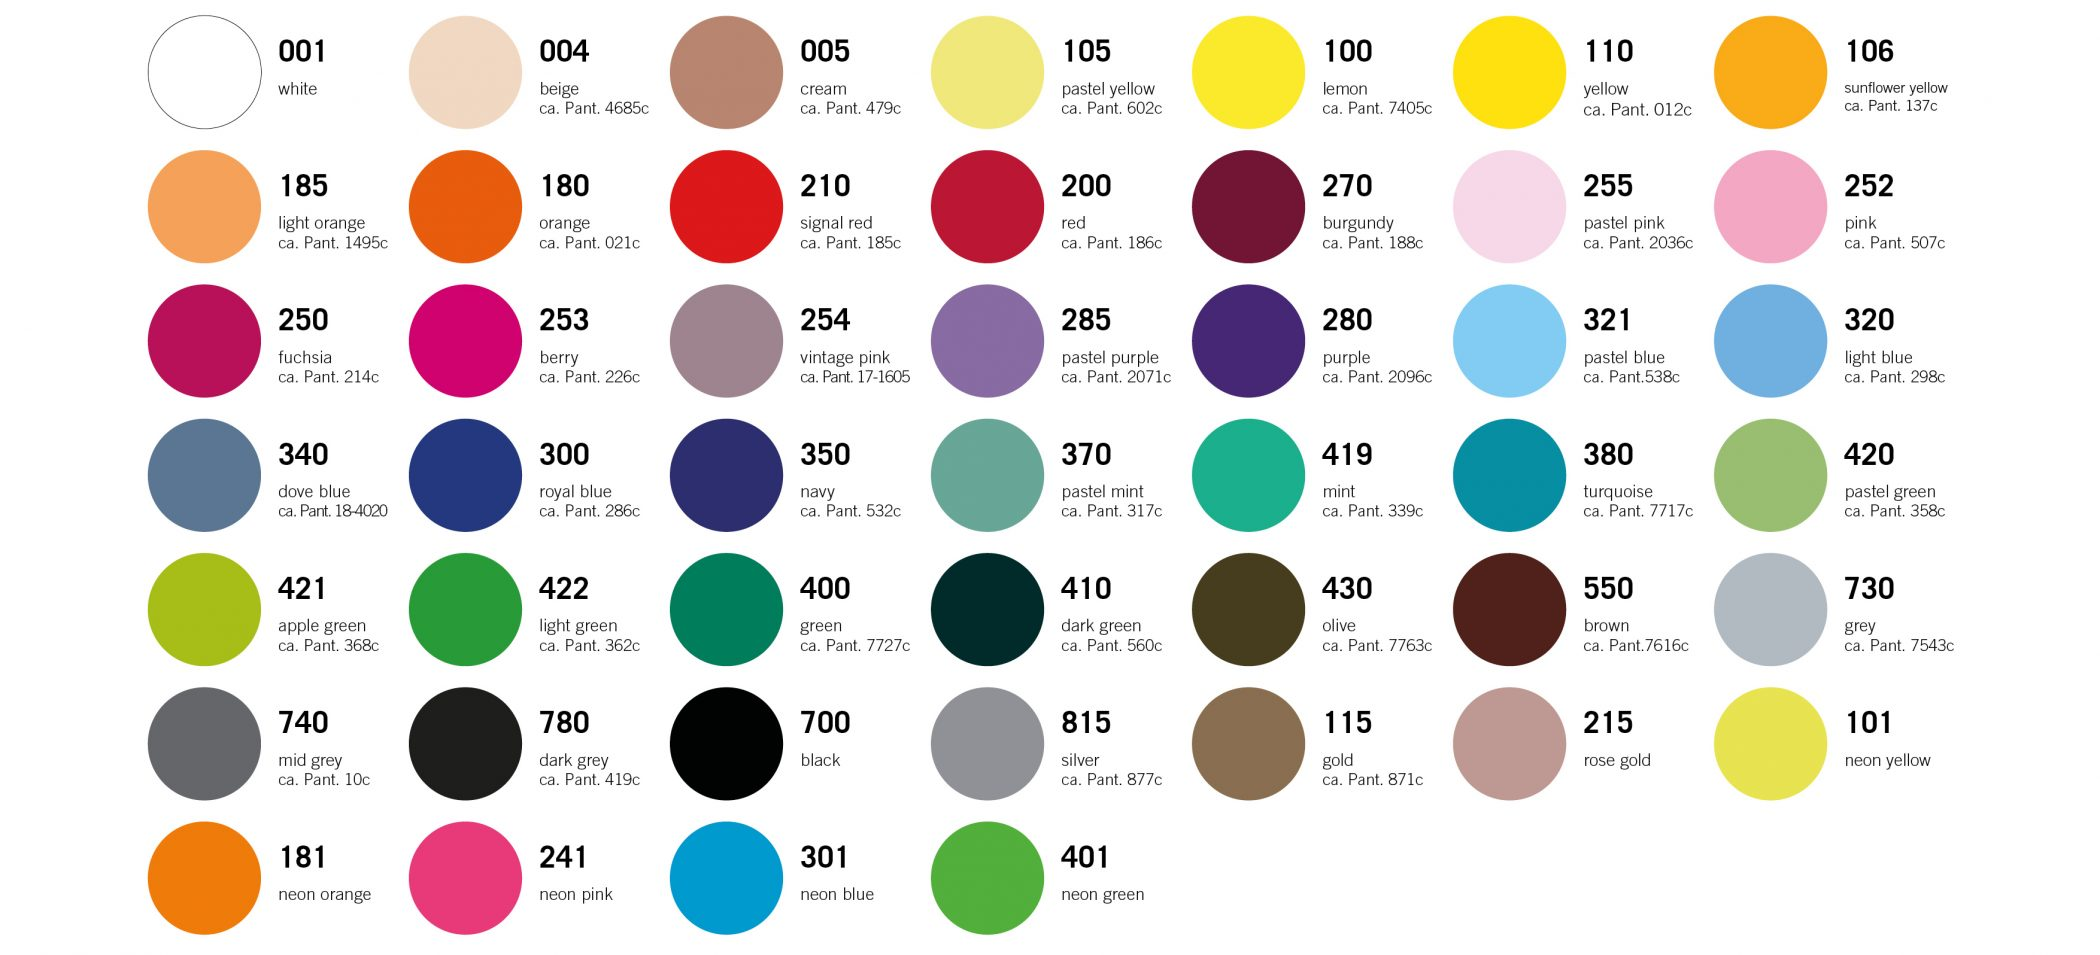 CAD-CUT_Color-selection_Sportsfim_Stahls-Asia_07-21